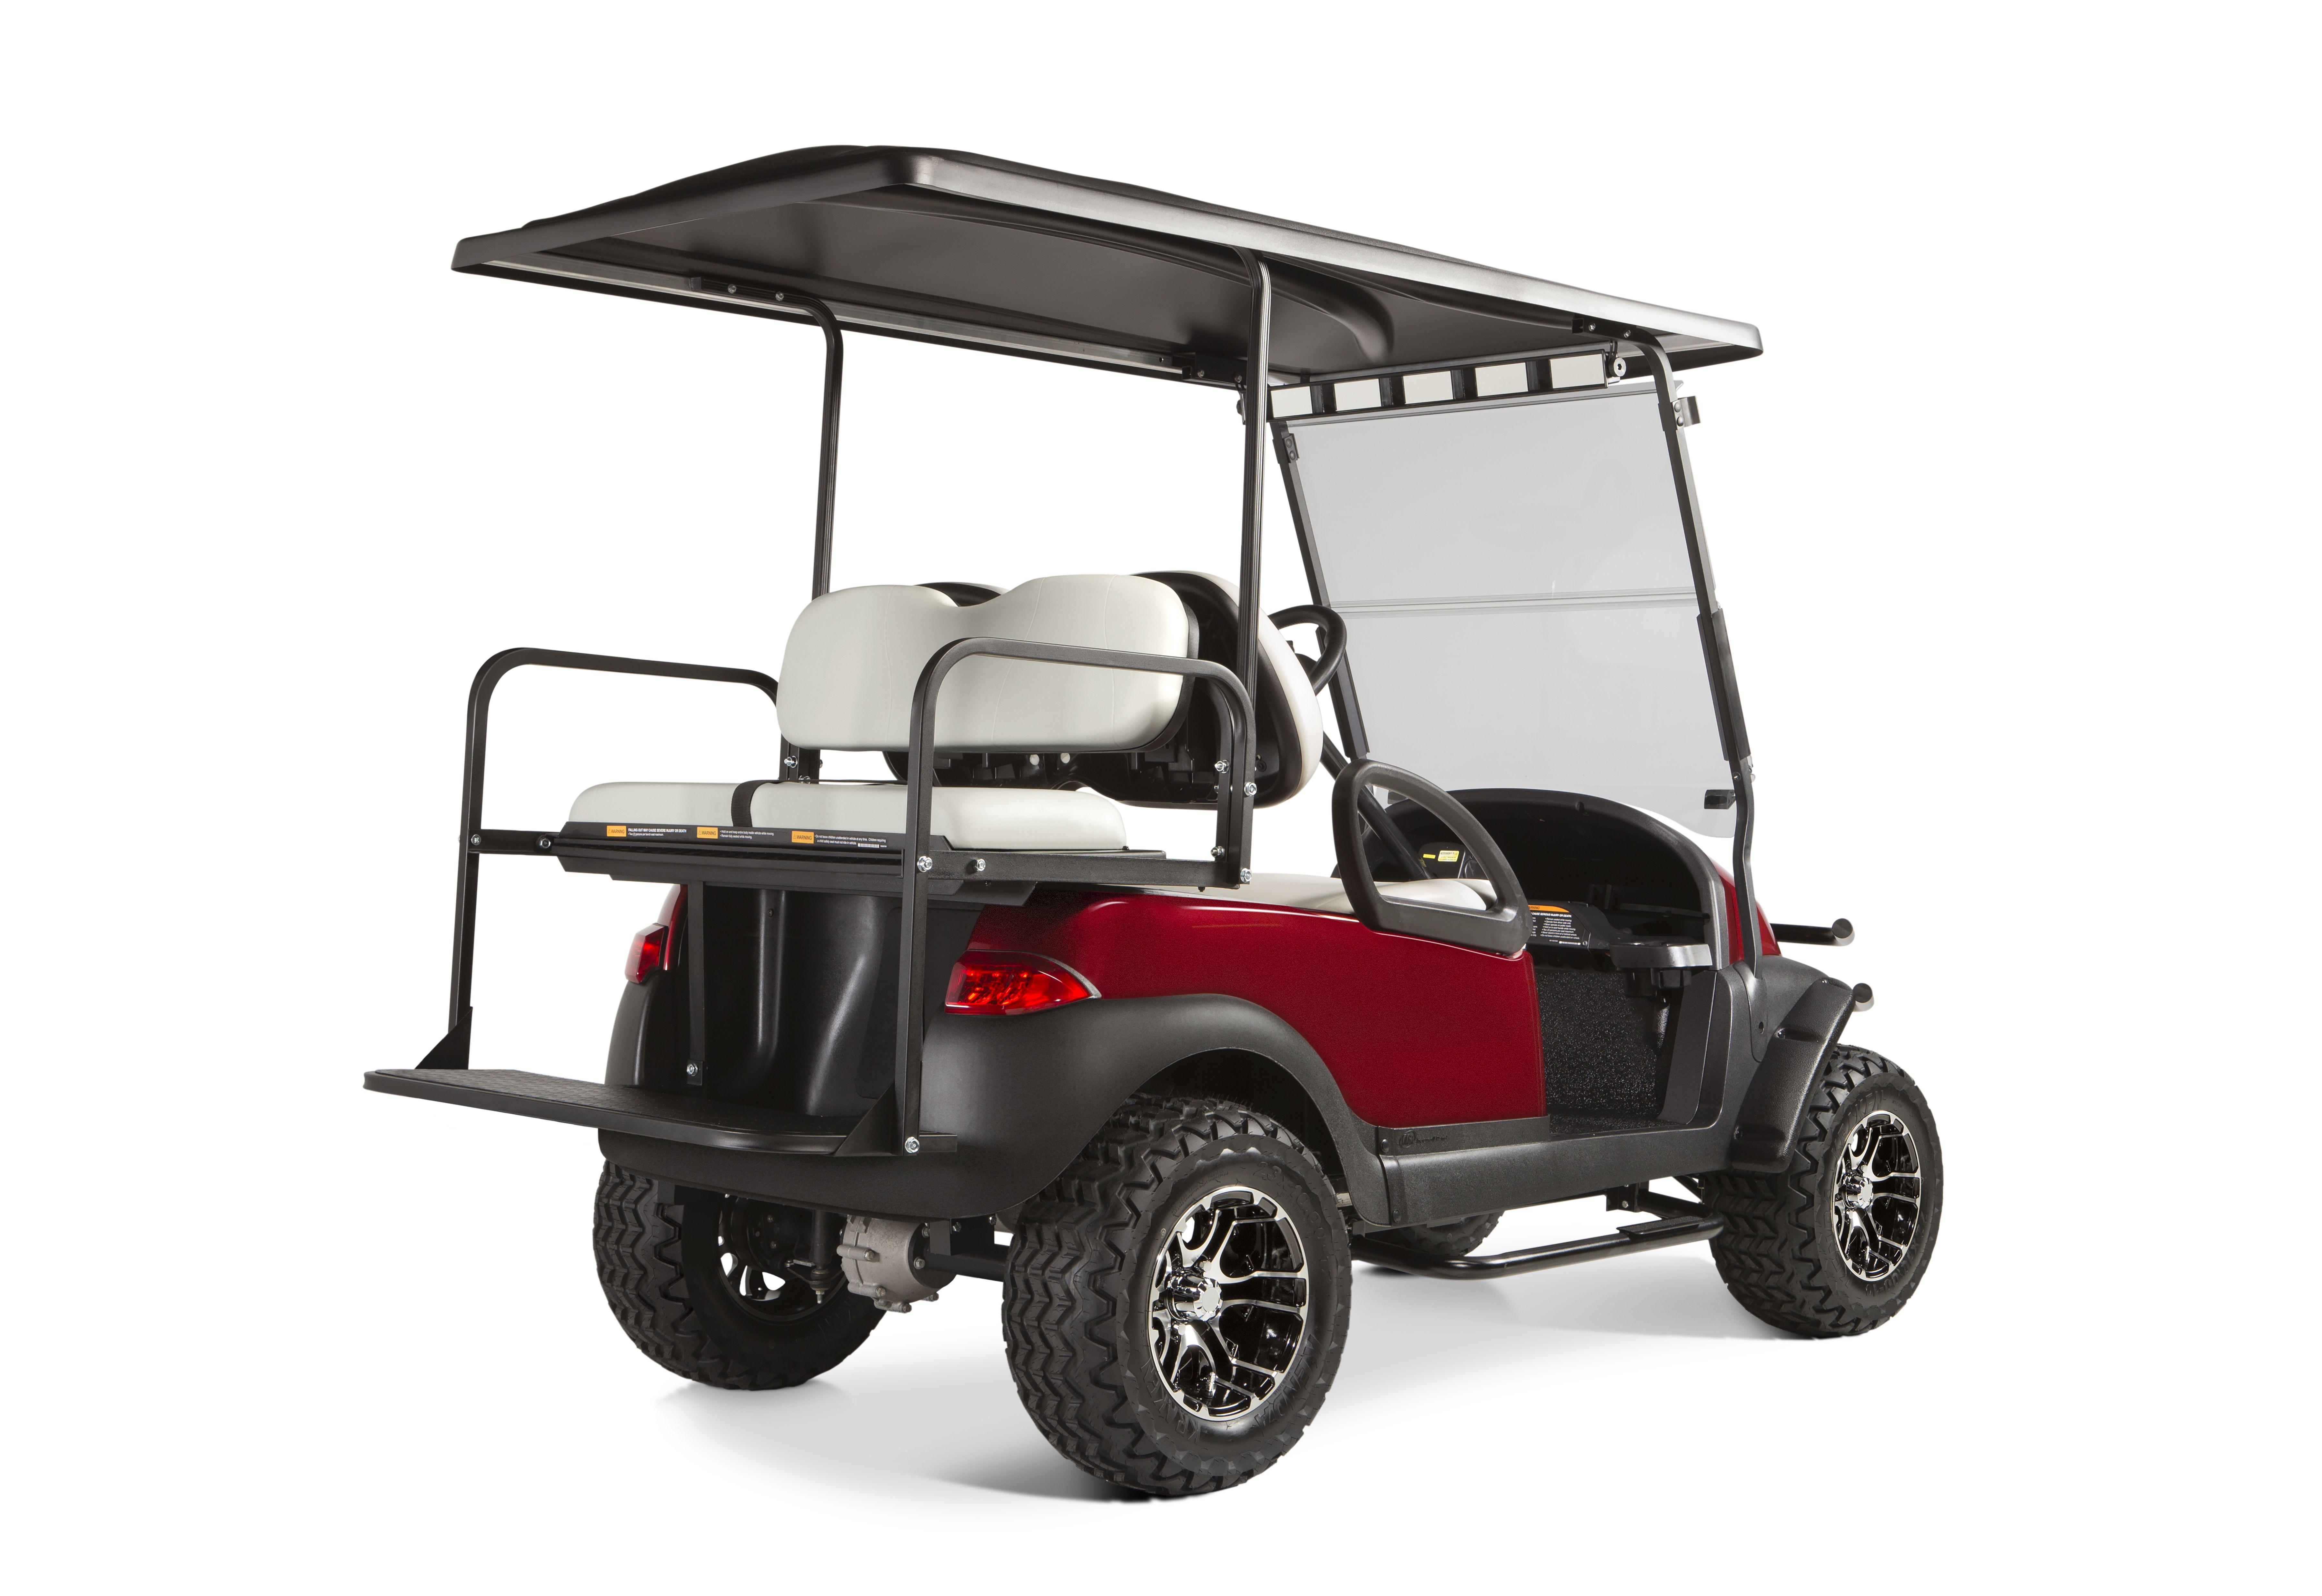 new 4 inch lift kit for club car precedent electric golf. Black Bedroom Furniture Sets. Home Design Ideas